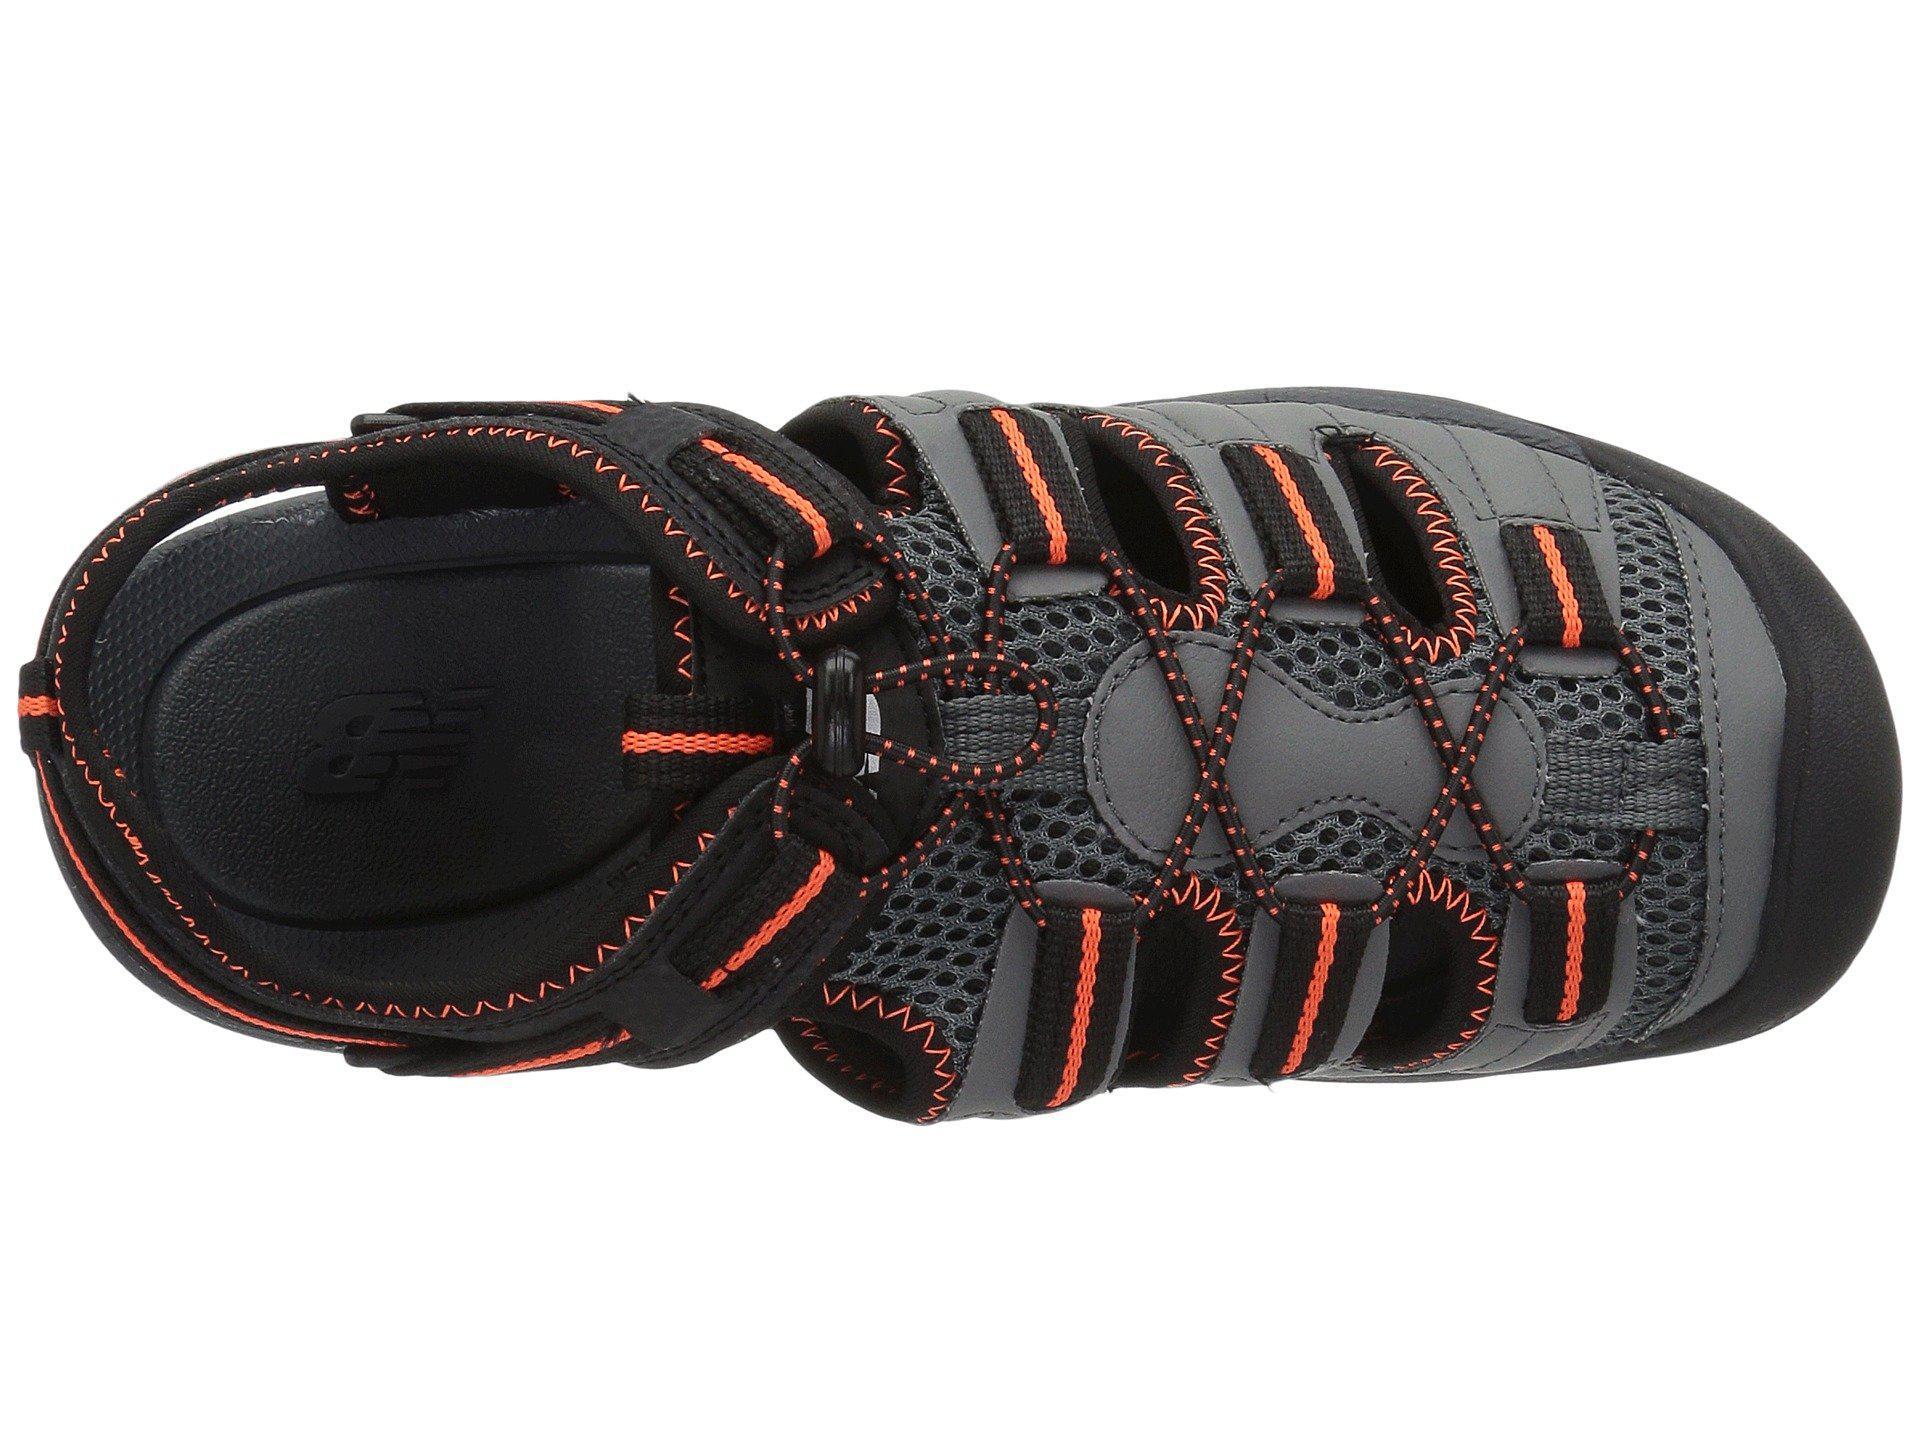 fe1ee51cad31 New Balance - Pink Appalachian Sandal (black orange) Men s Shoes for Men -.  View fullscreen